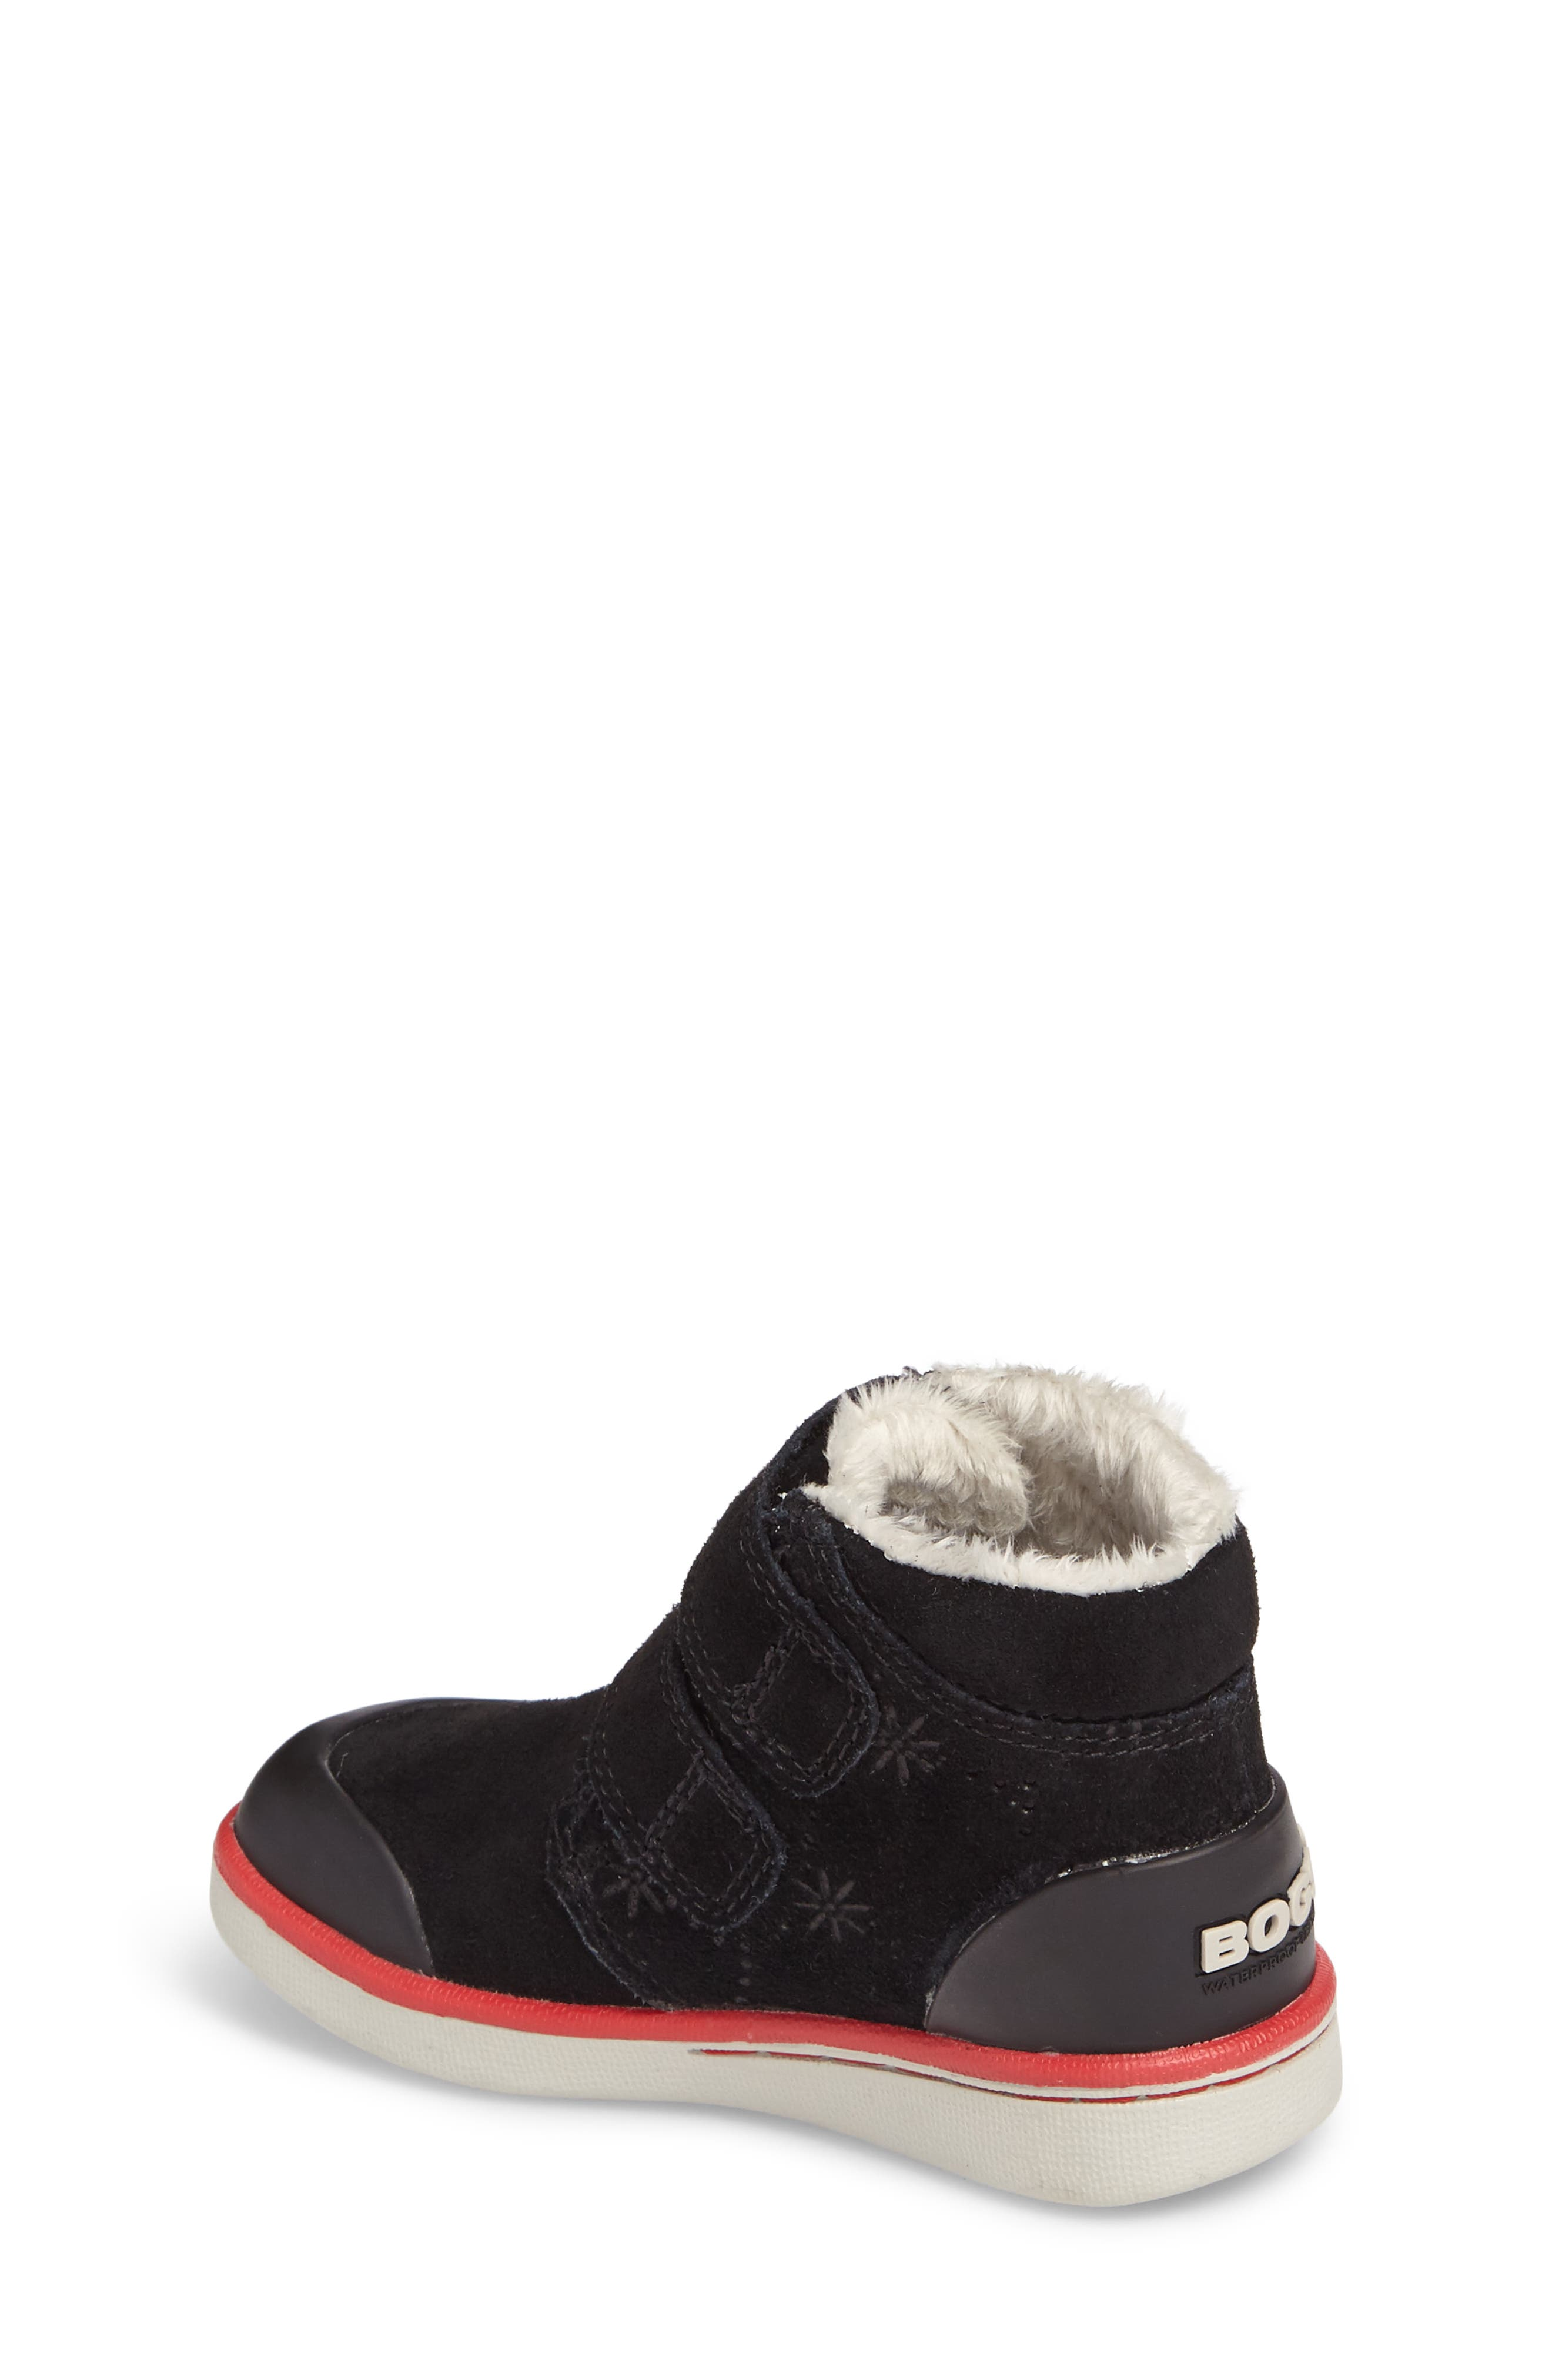 Samantha Faux Fur Waterproof Boot,                             Alternate thumbnail 2, color,                             Black/ Black